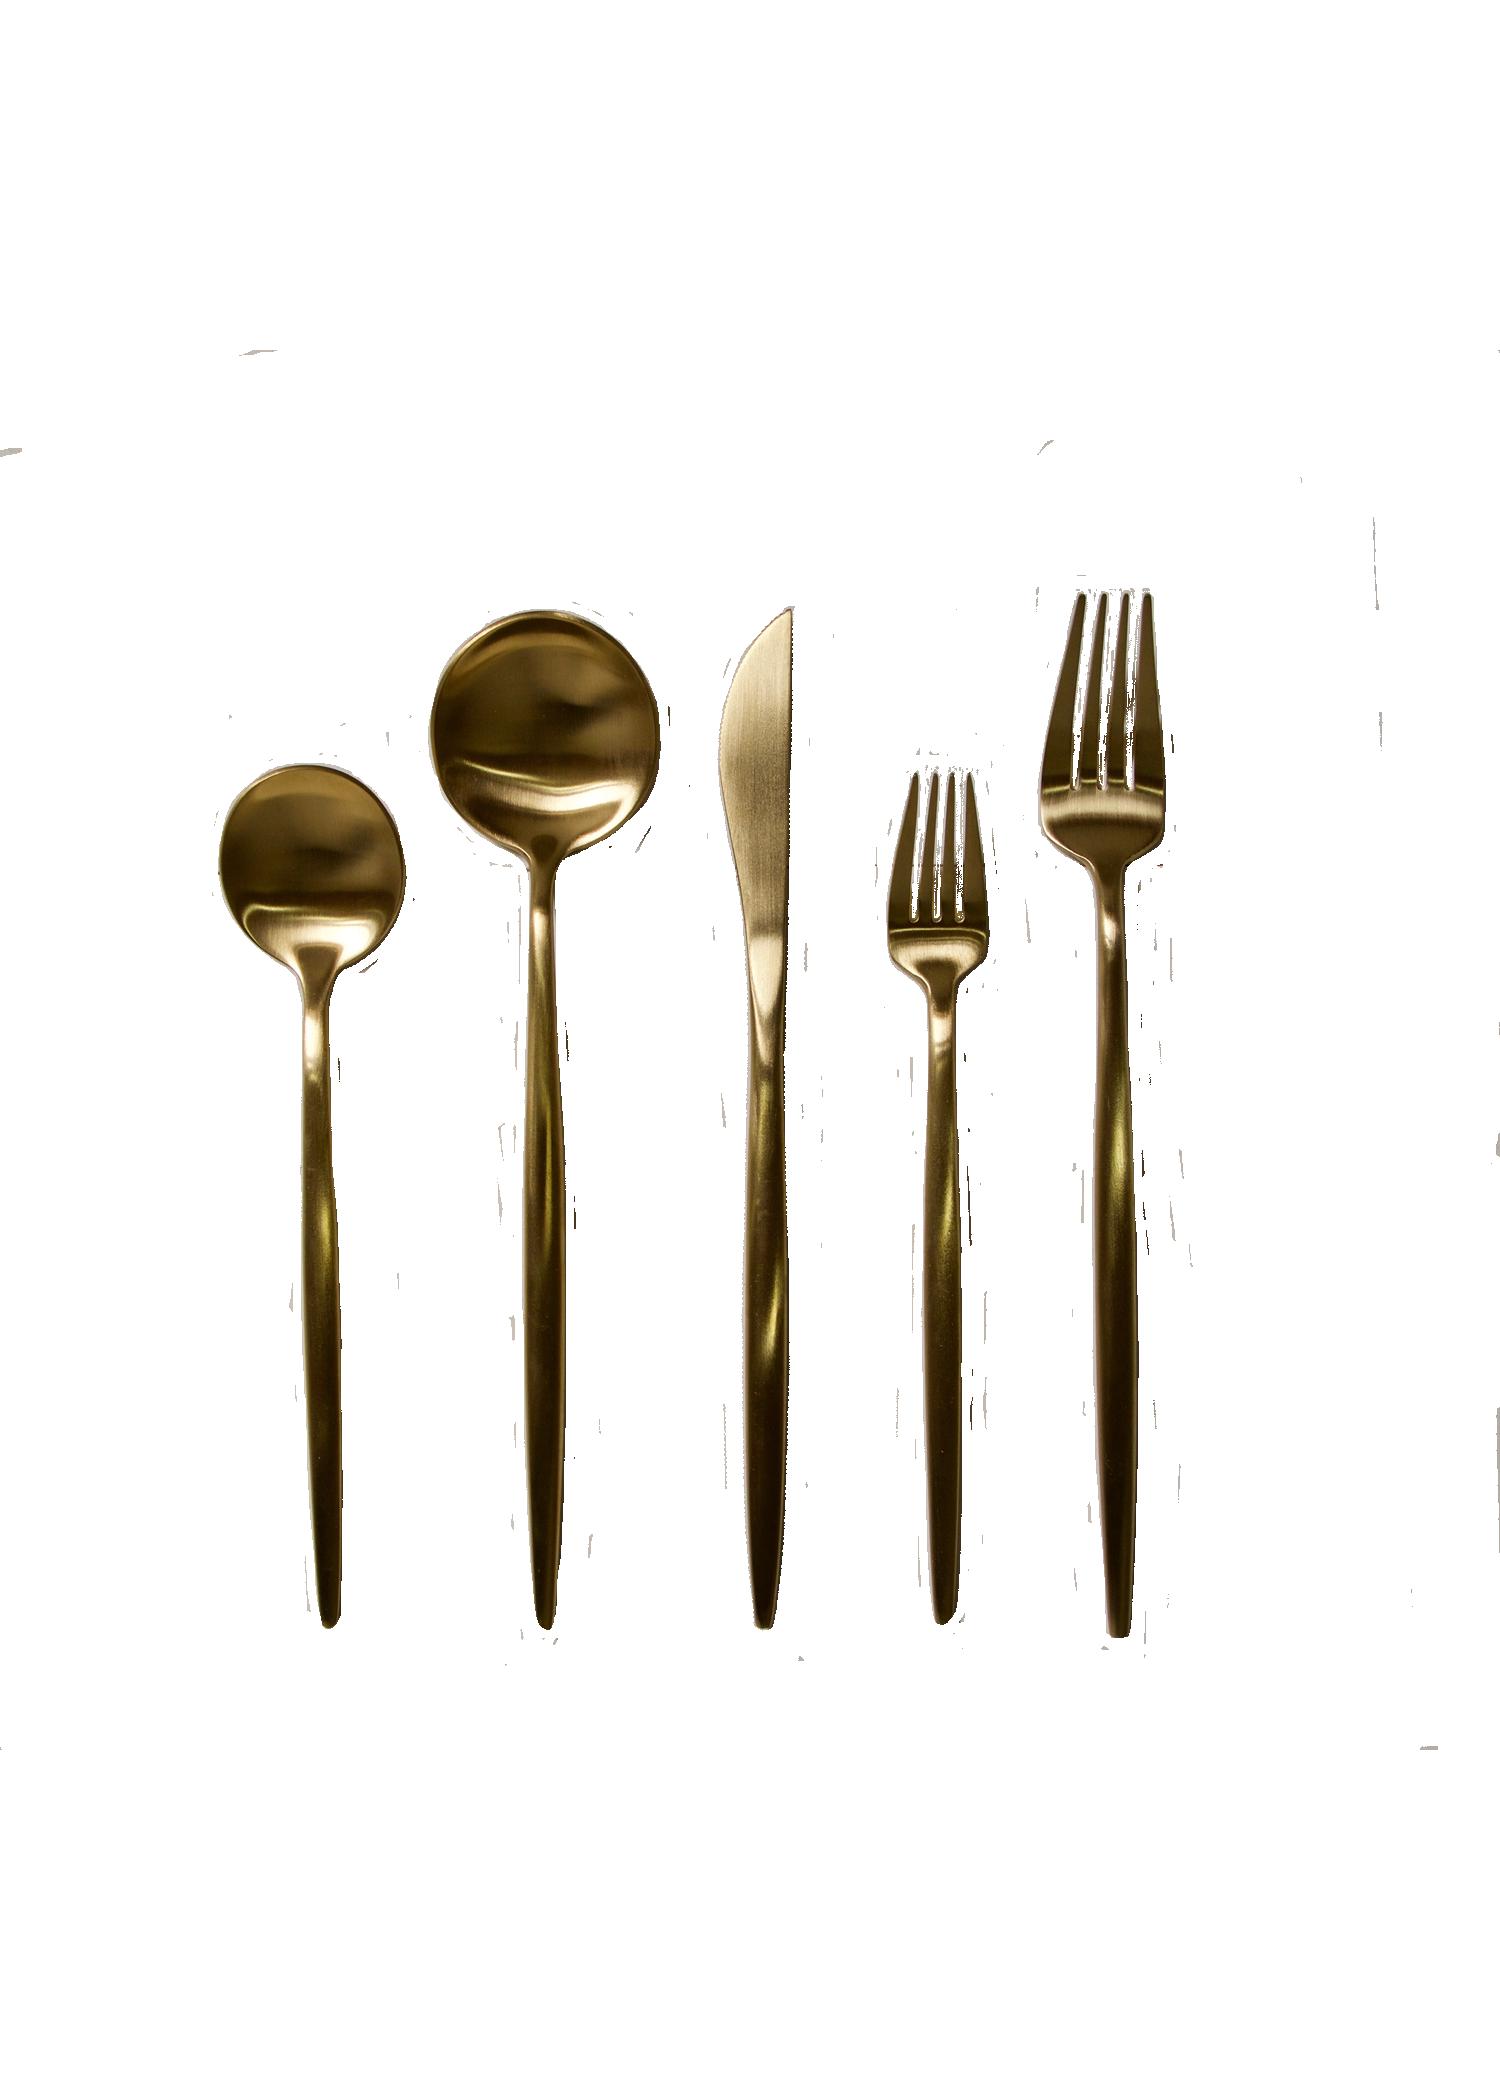 5-piece Gold Flatware